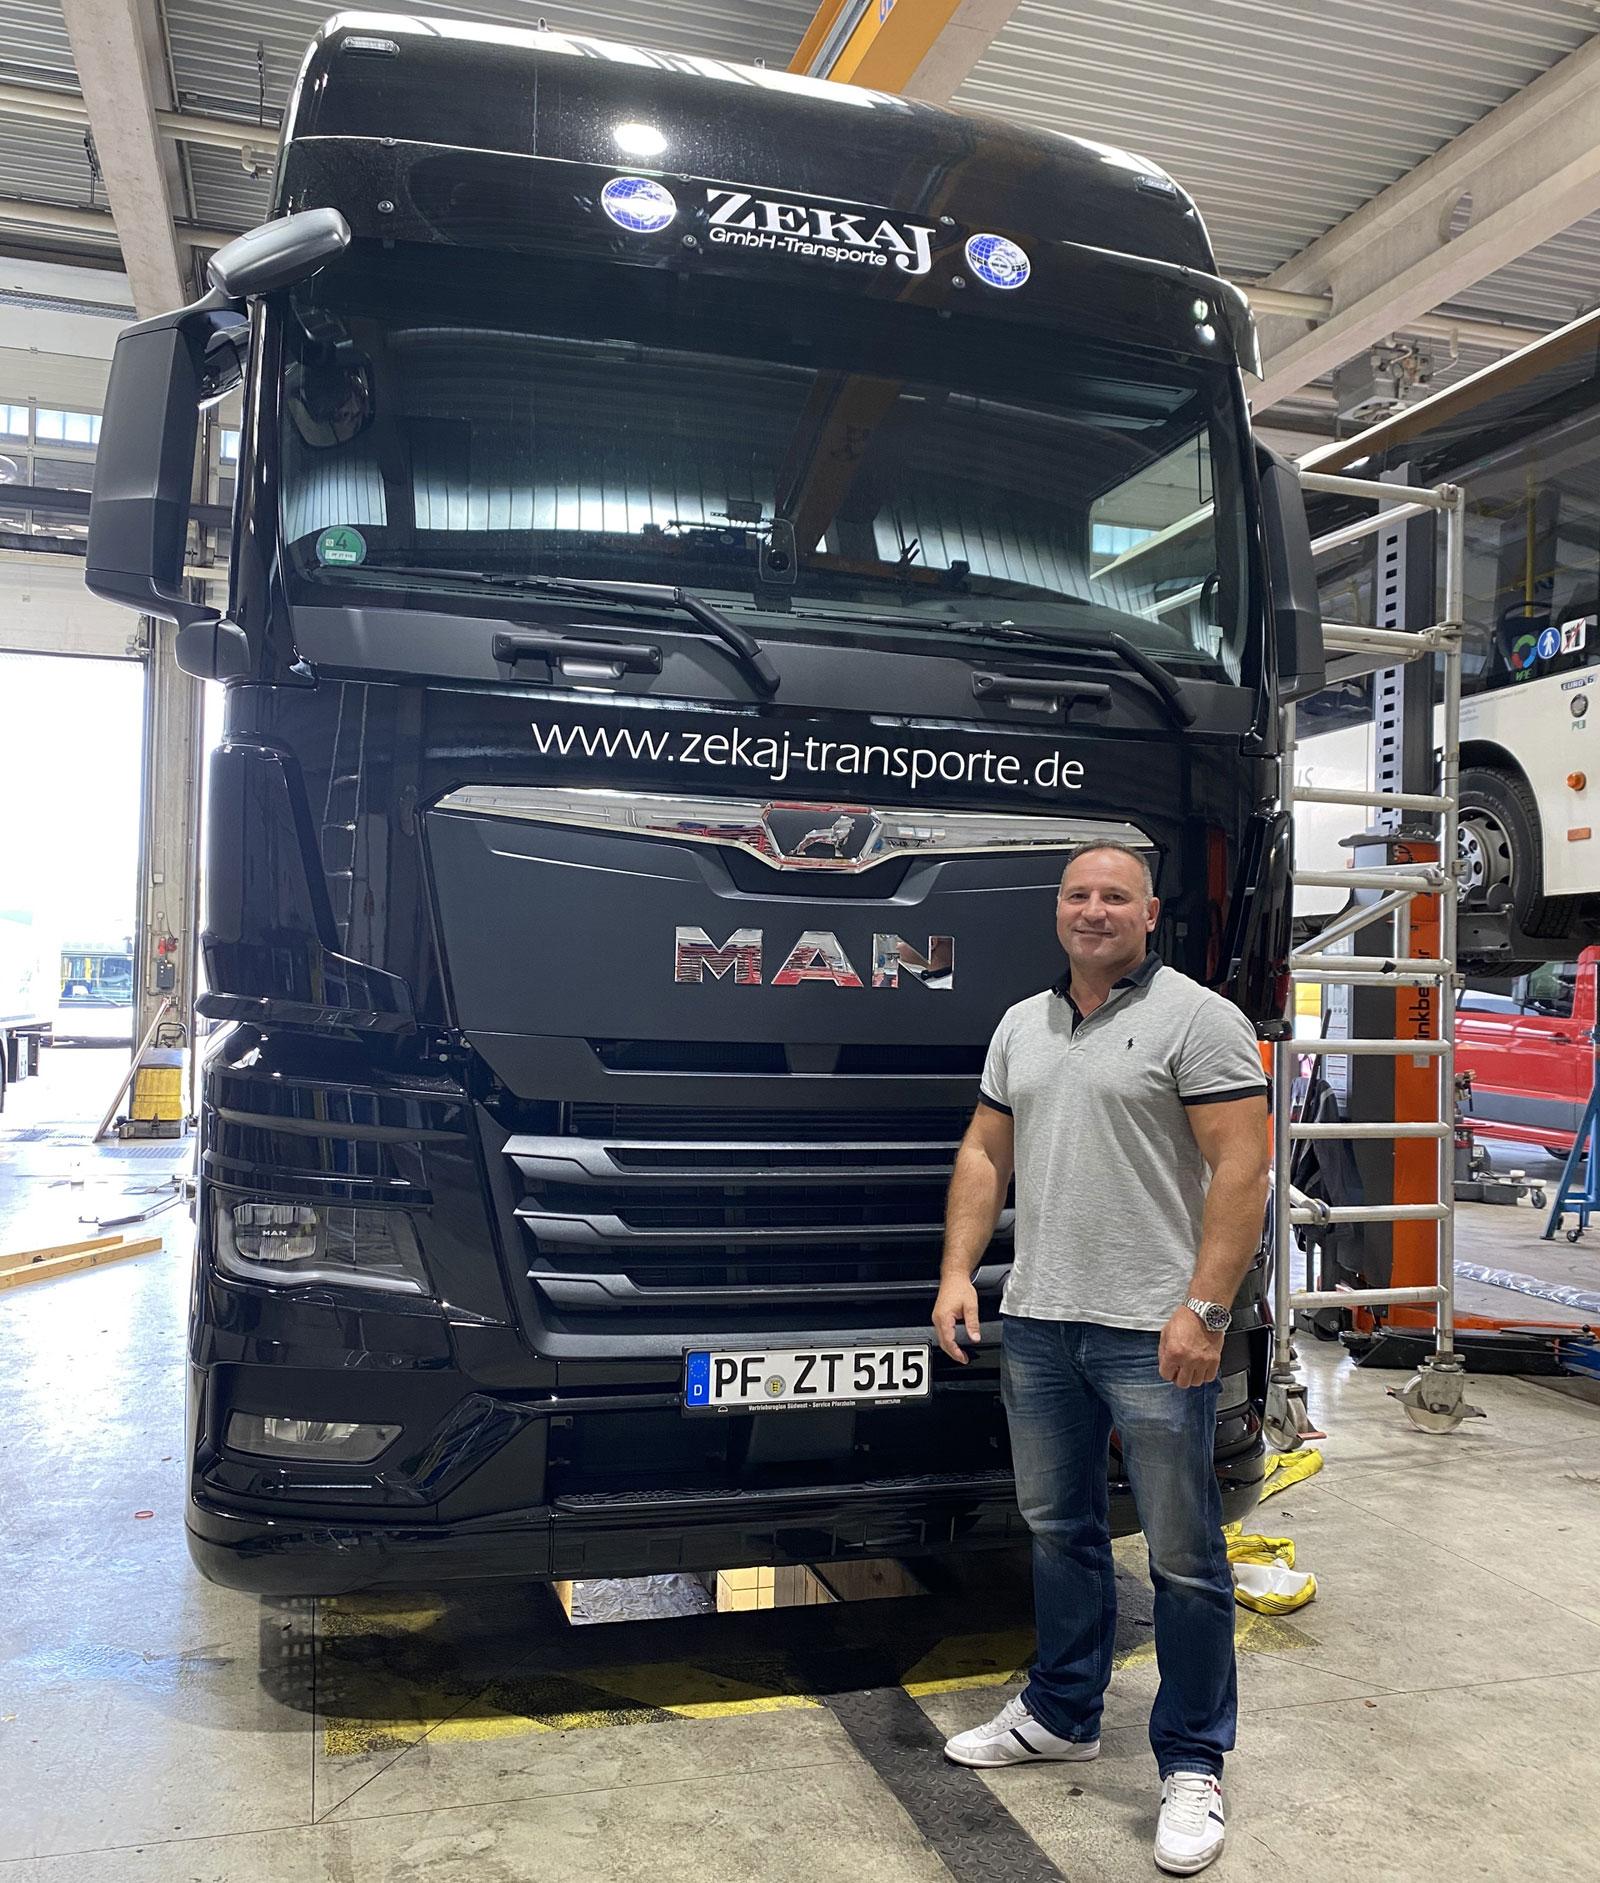 Zekaj GmbH - Elez Zekaj